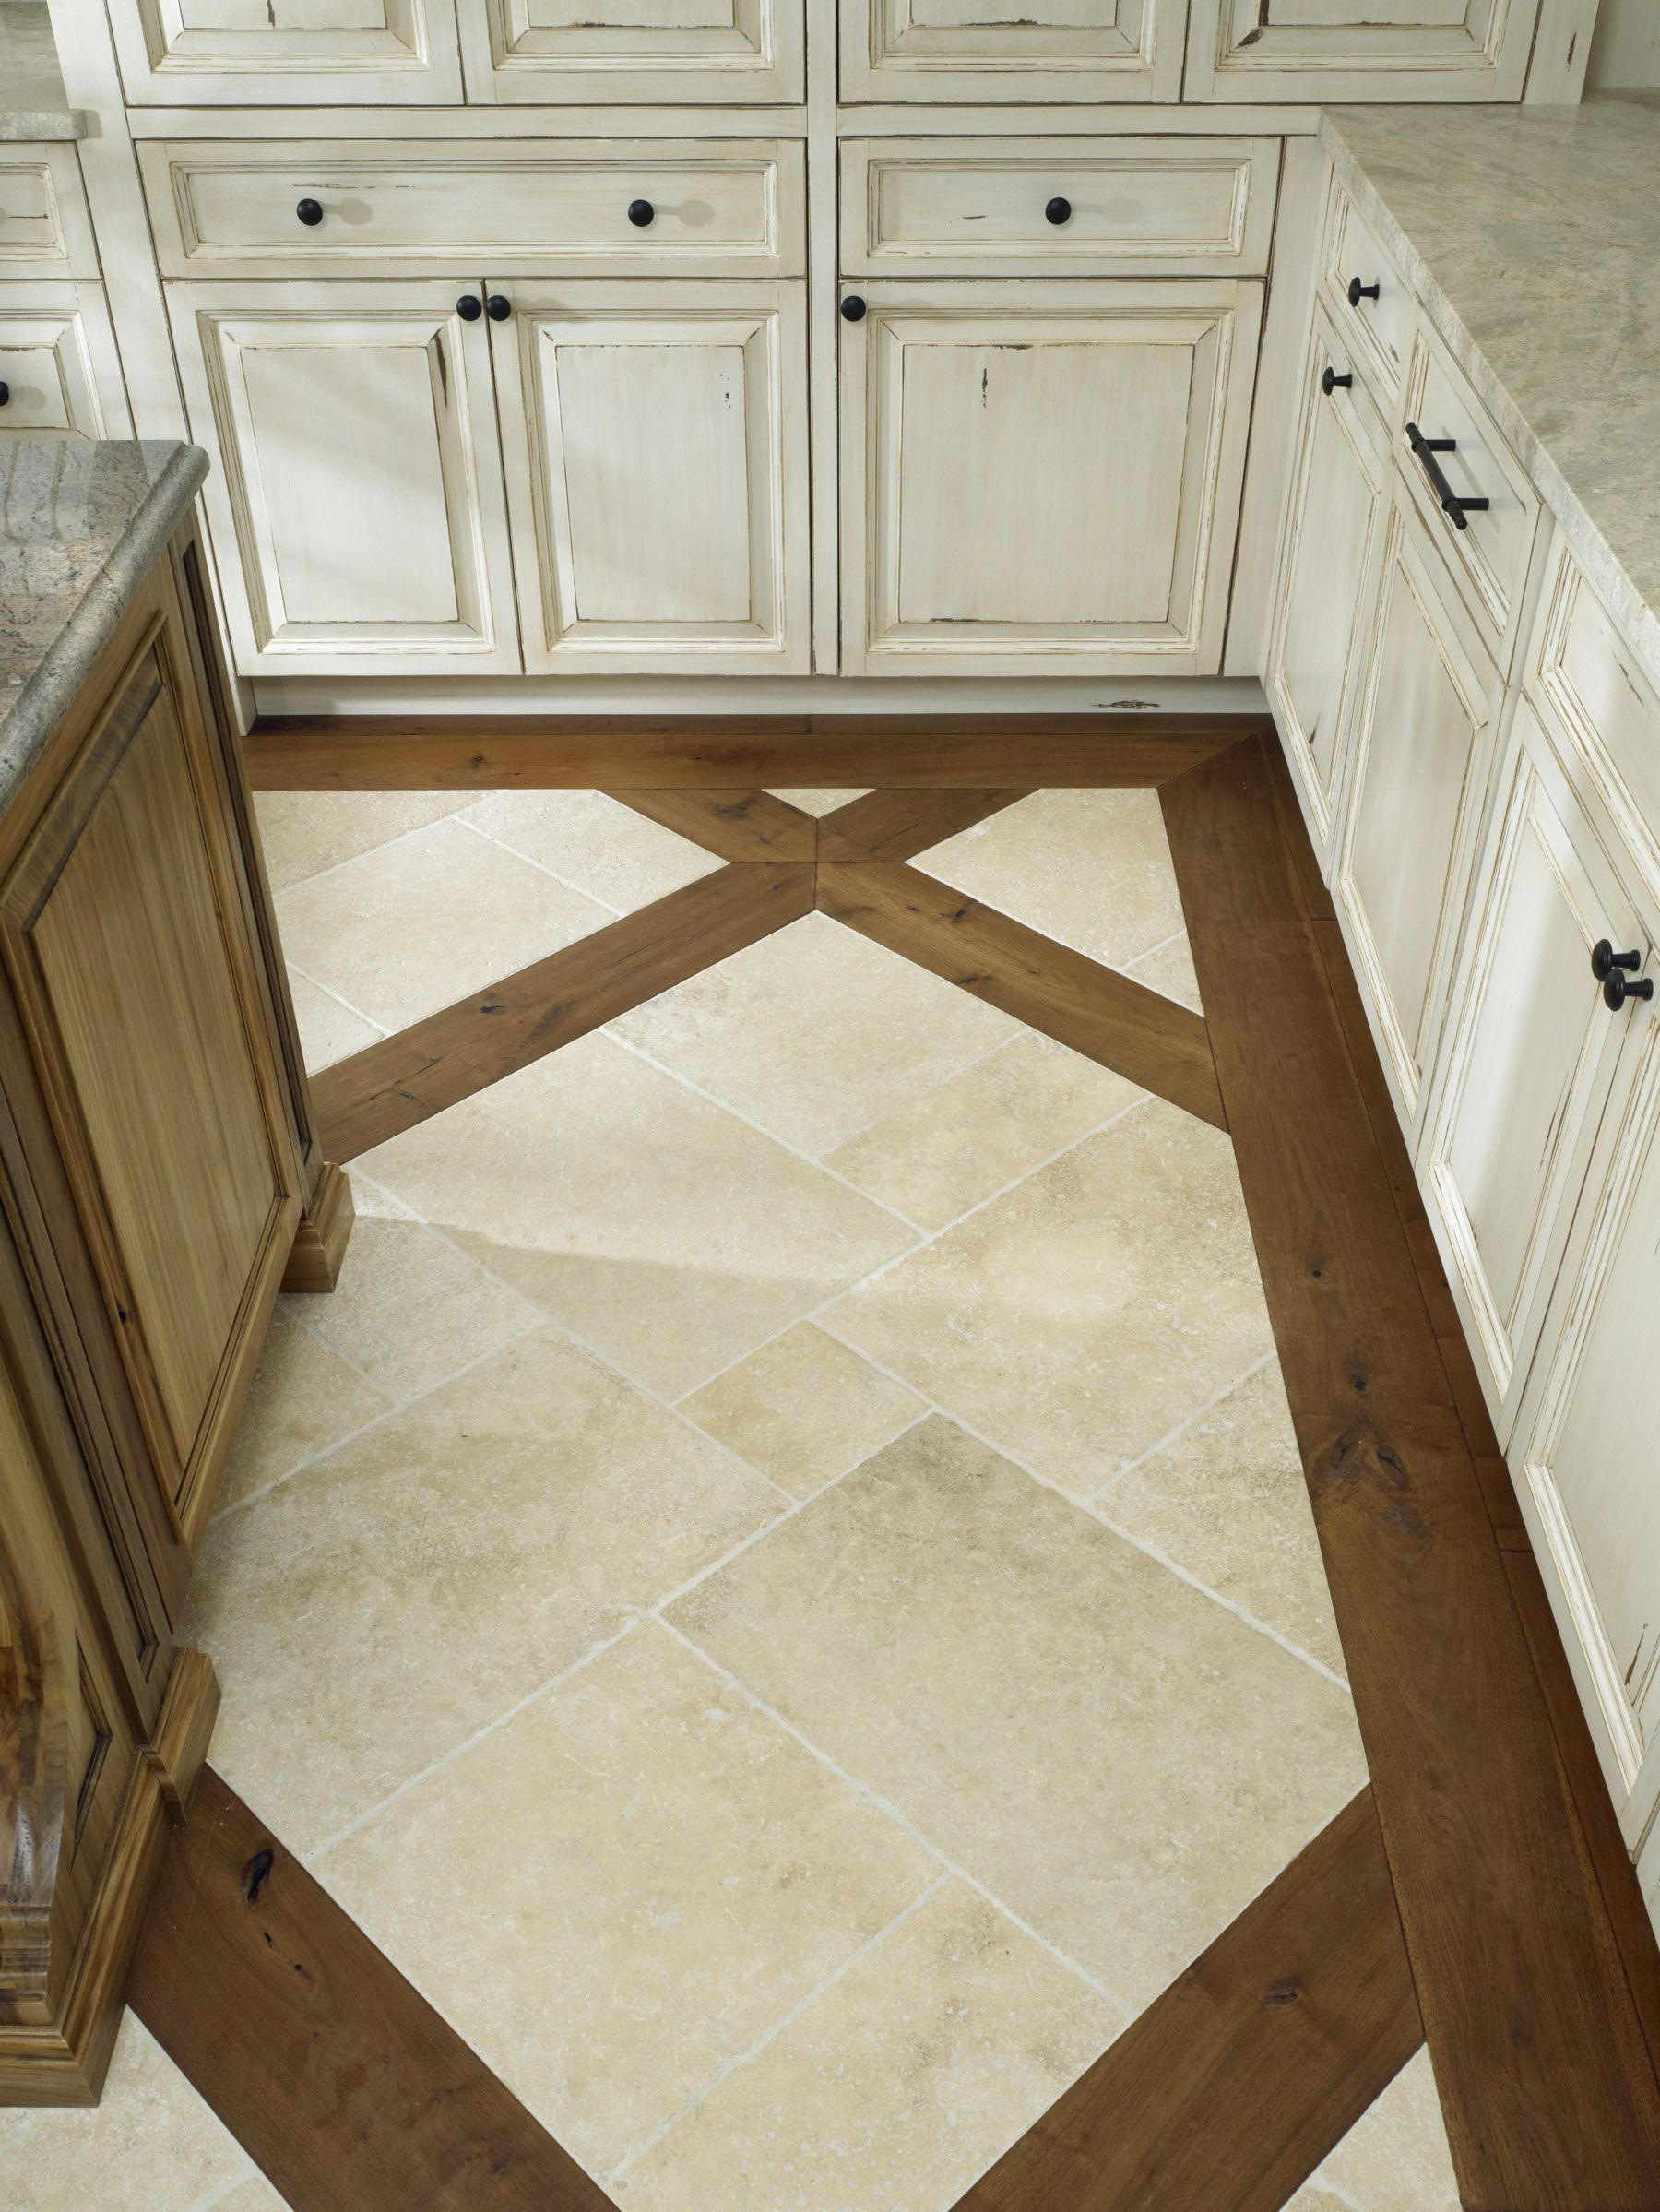 Ceramic floor wood inlay benvenutiandstein remodel ceramic floor wood inlay benvenutiandstein dailygadgetfo Image collections